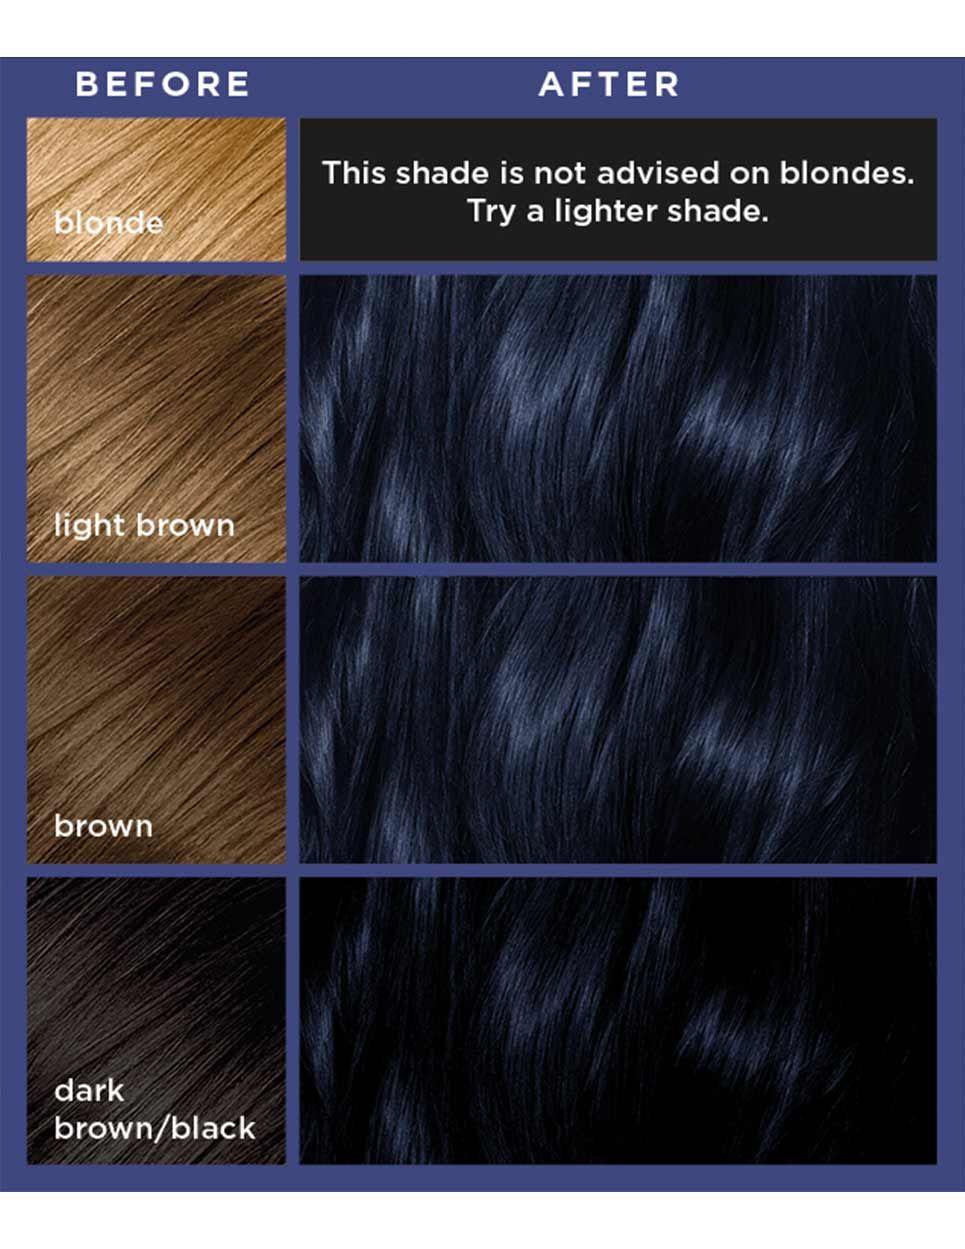 L Oreal Colorista Blue Black Permanent Gel Hair Dye L Oreal Paris In 2020 Dark Hair Dye Blue Hair Dark Hair Color For Black Hair